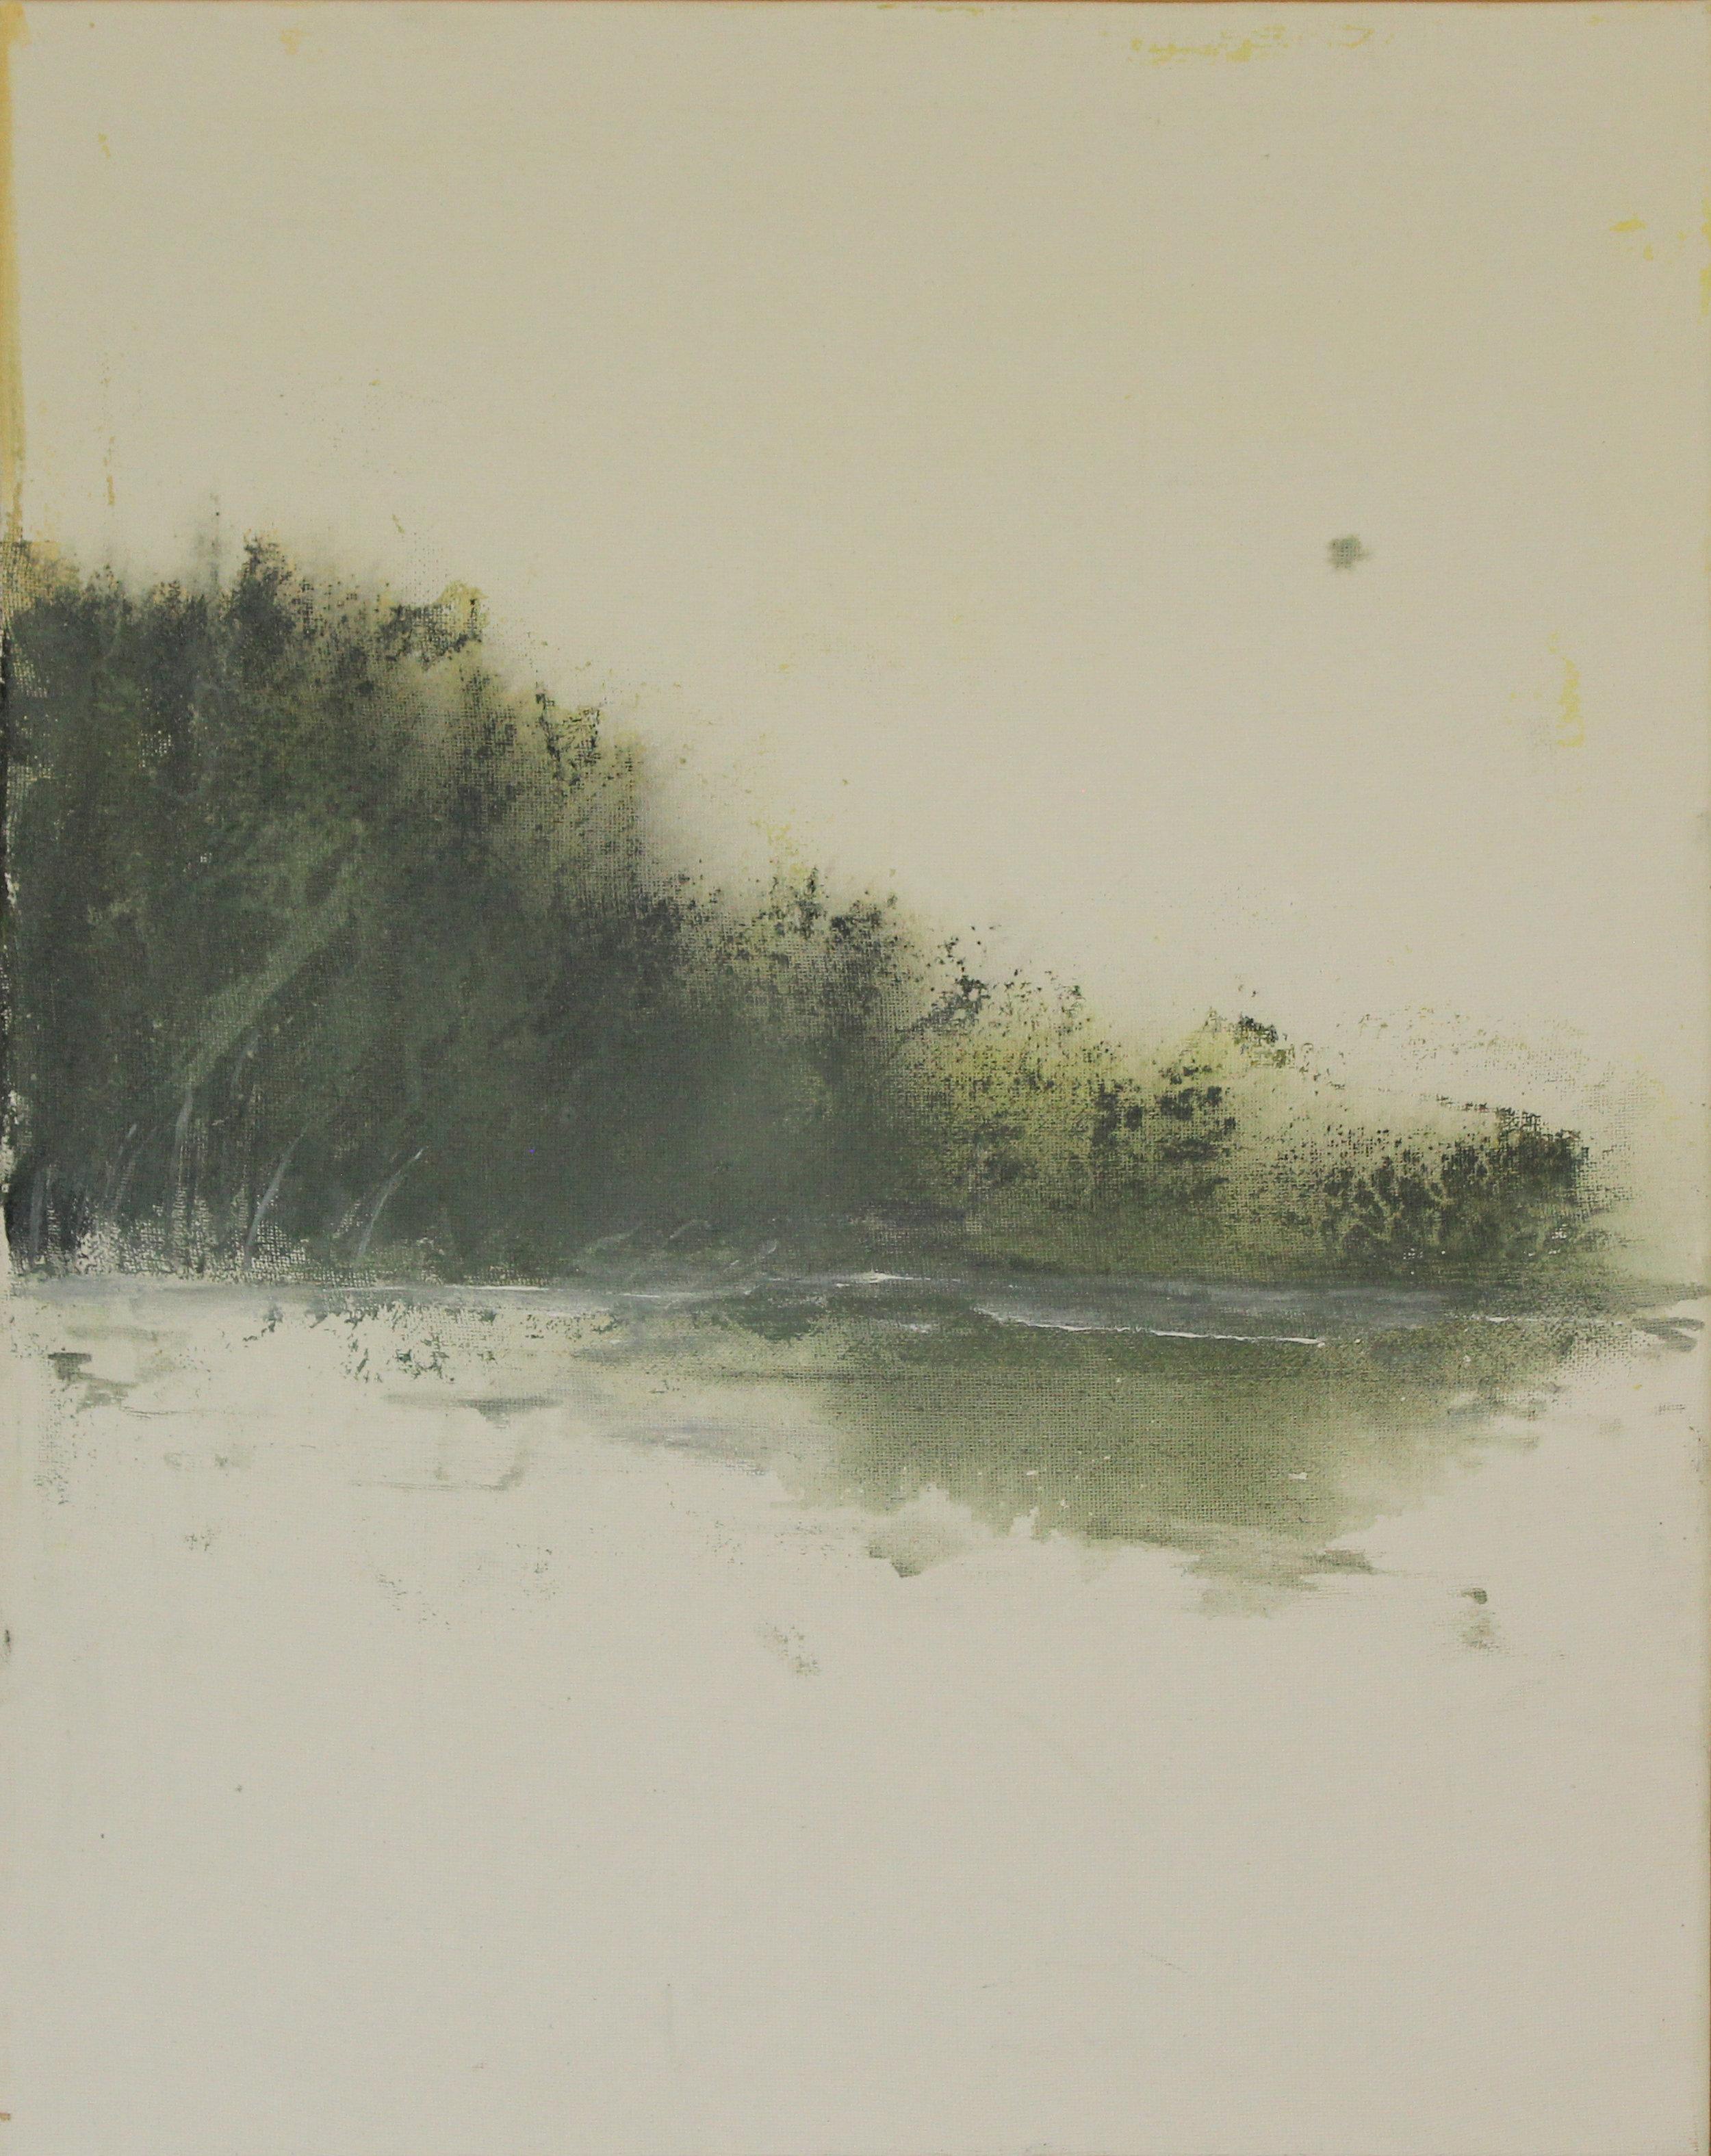 'Early winter foliage'